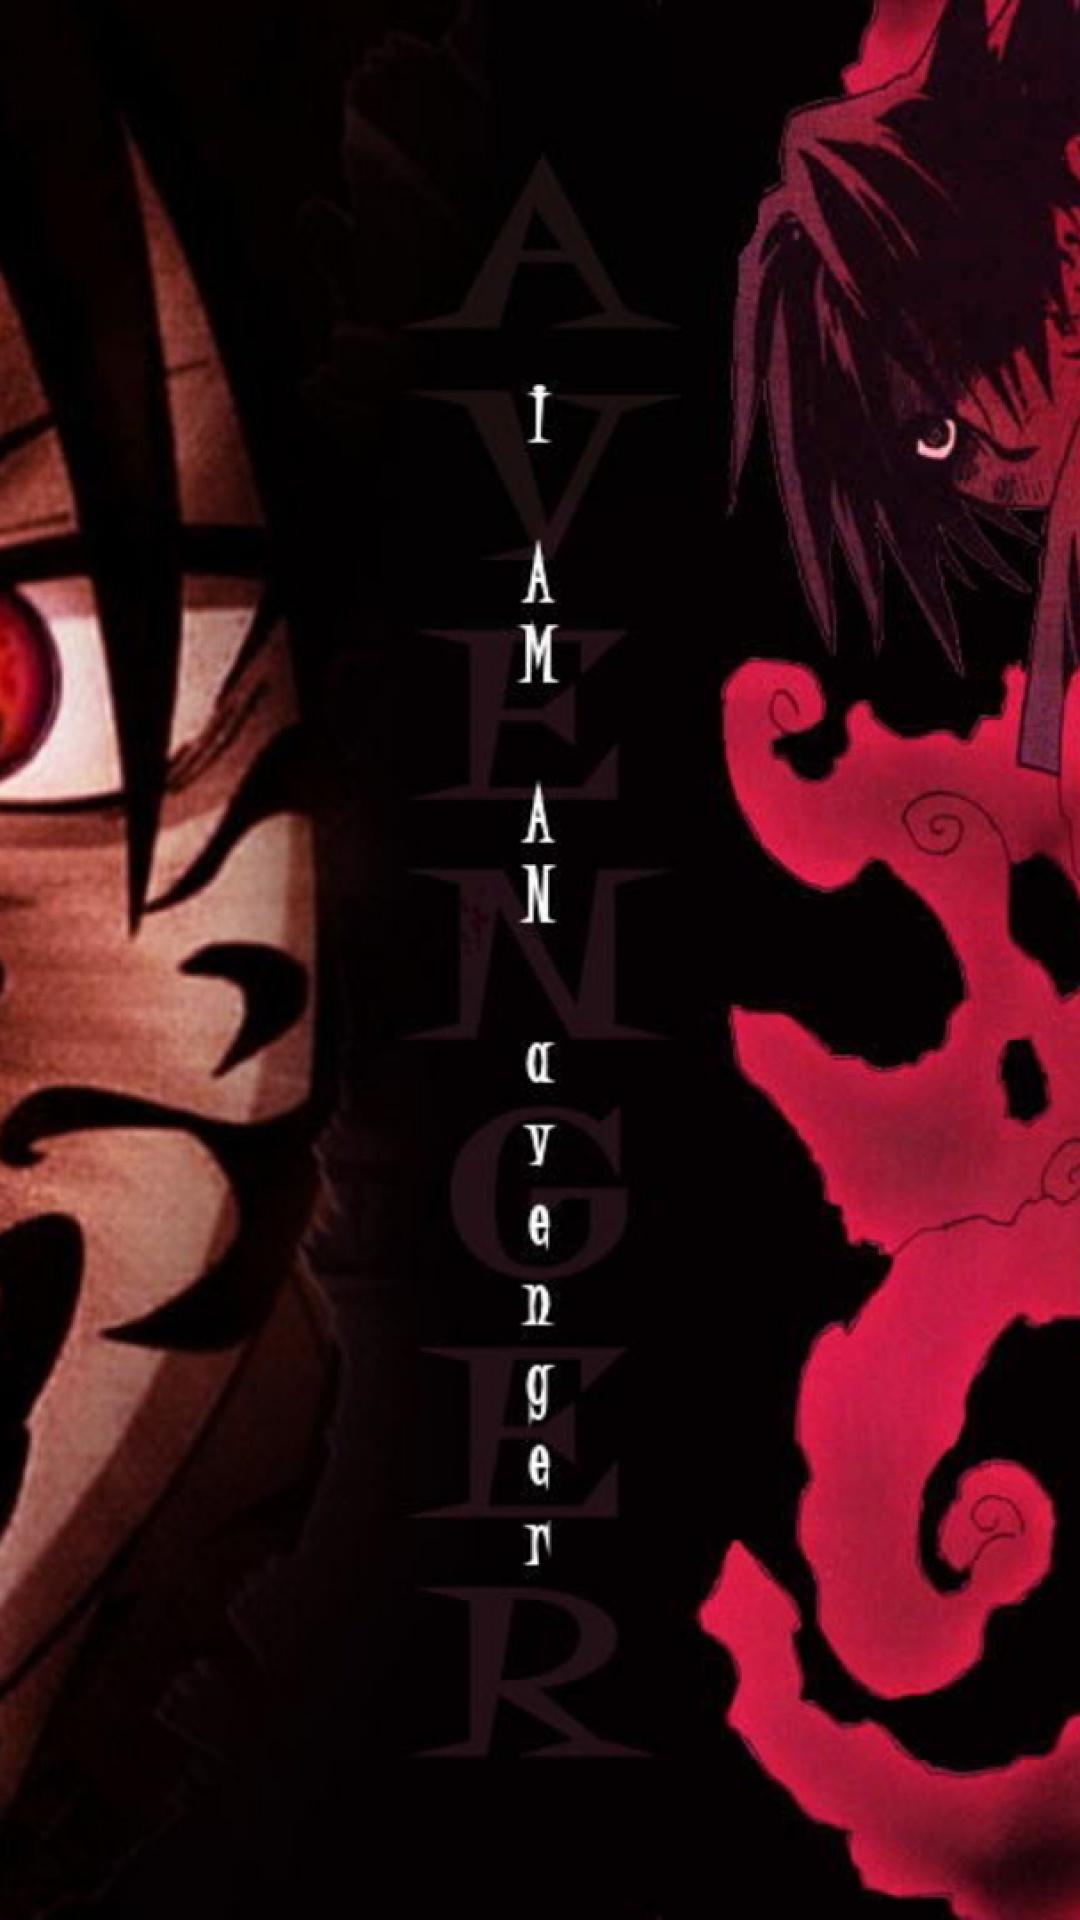 Sasuke Imagens Tumblr Naruto - HD Wallpaper